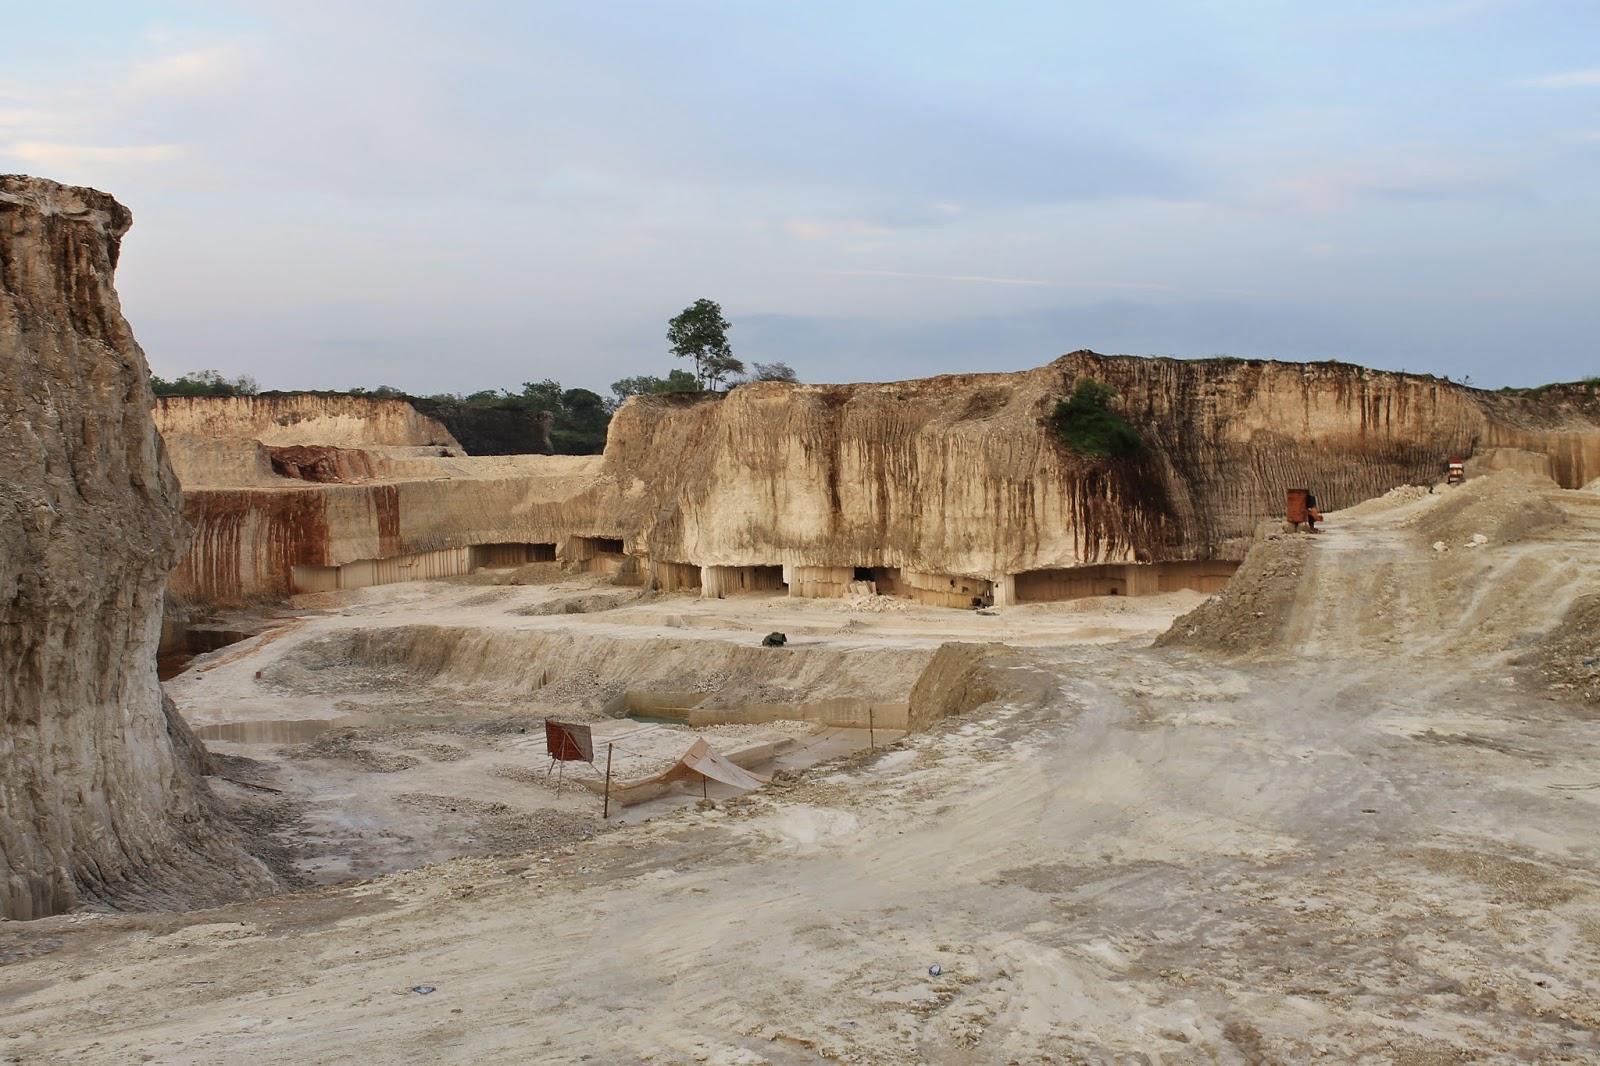 Pesona Bukit Jaddih Booming Wisata Jatim Aslinya Kapur Menjadi Lokasi